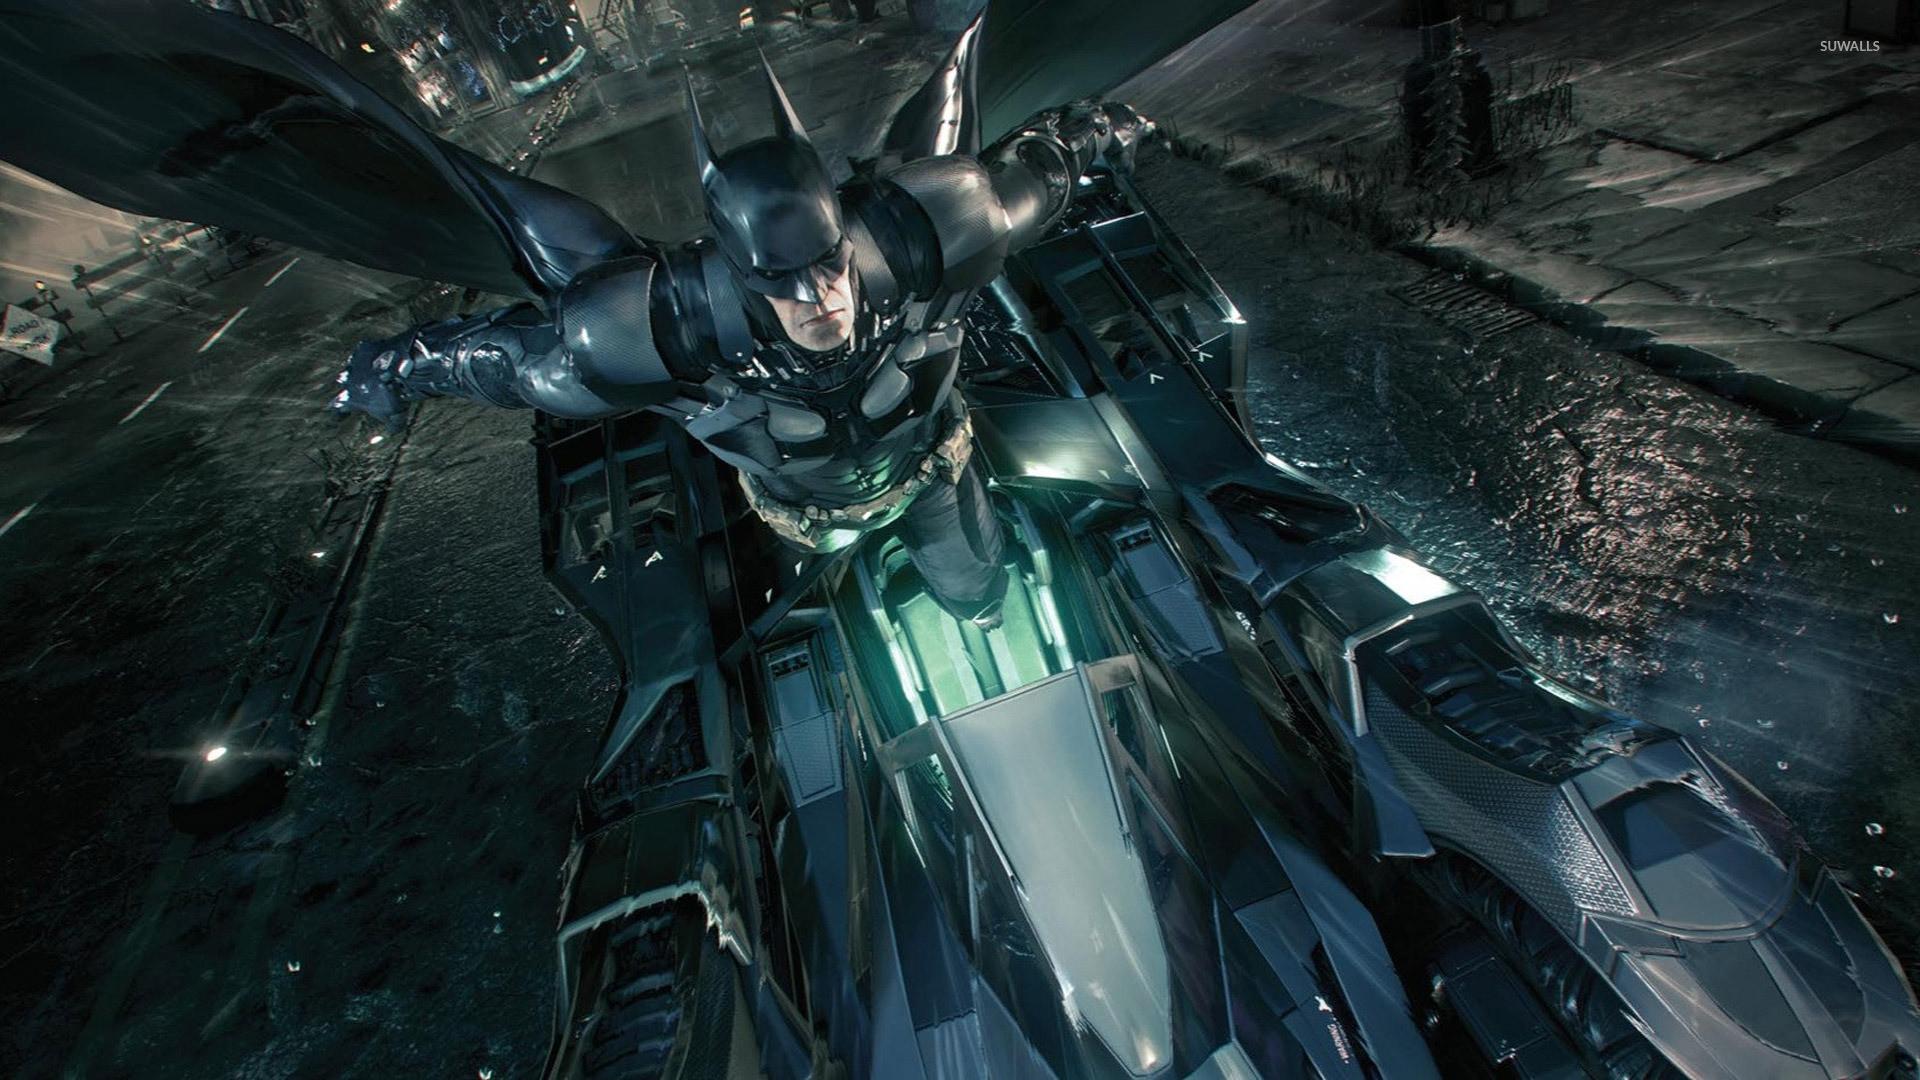 Batman: Arkham Knight [17] wallpaper jpg